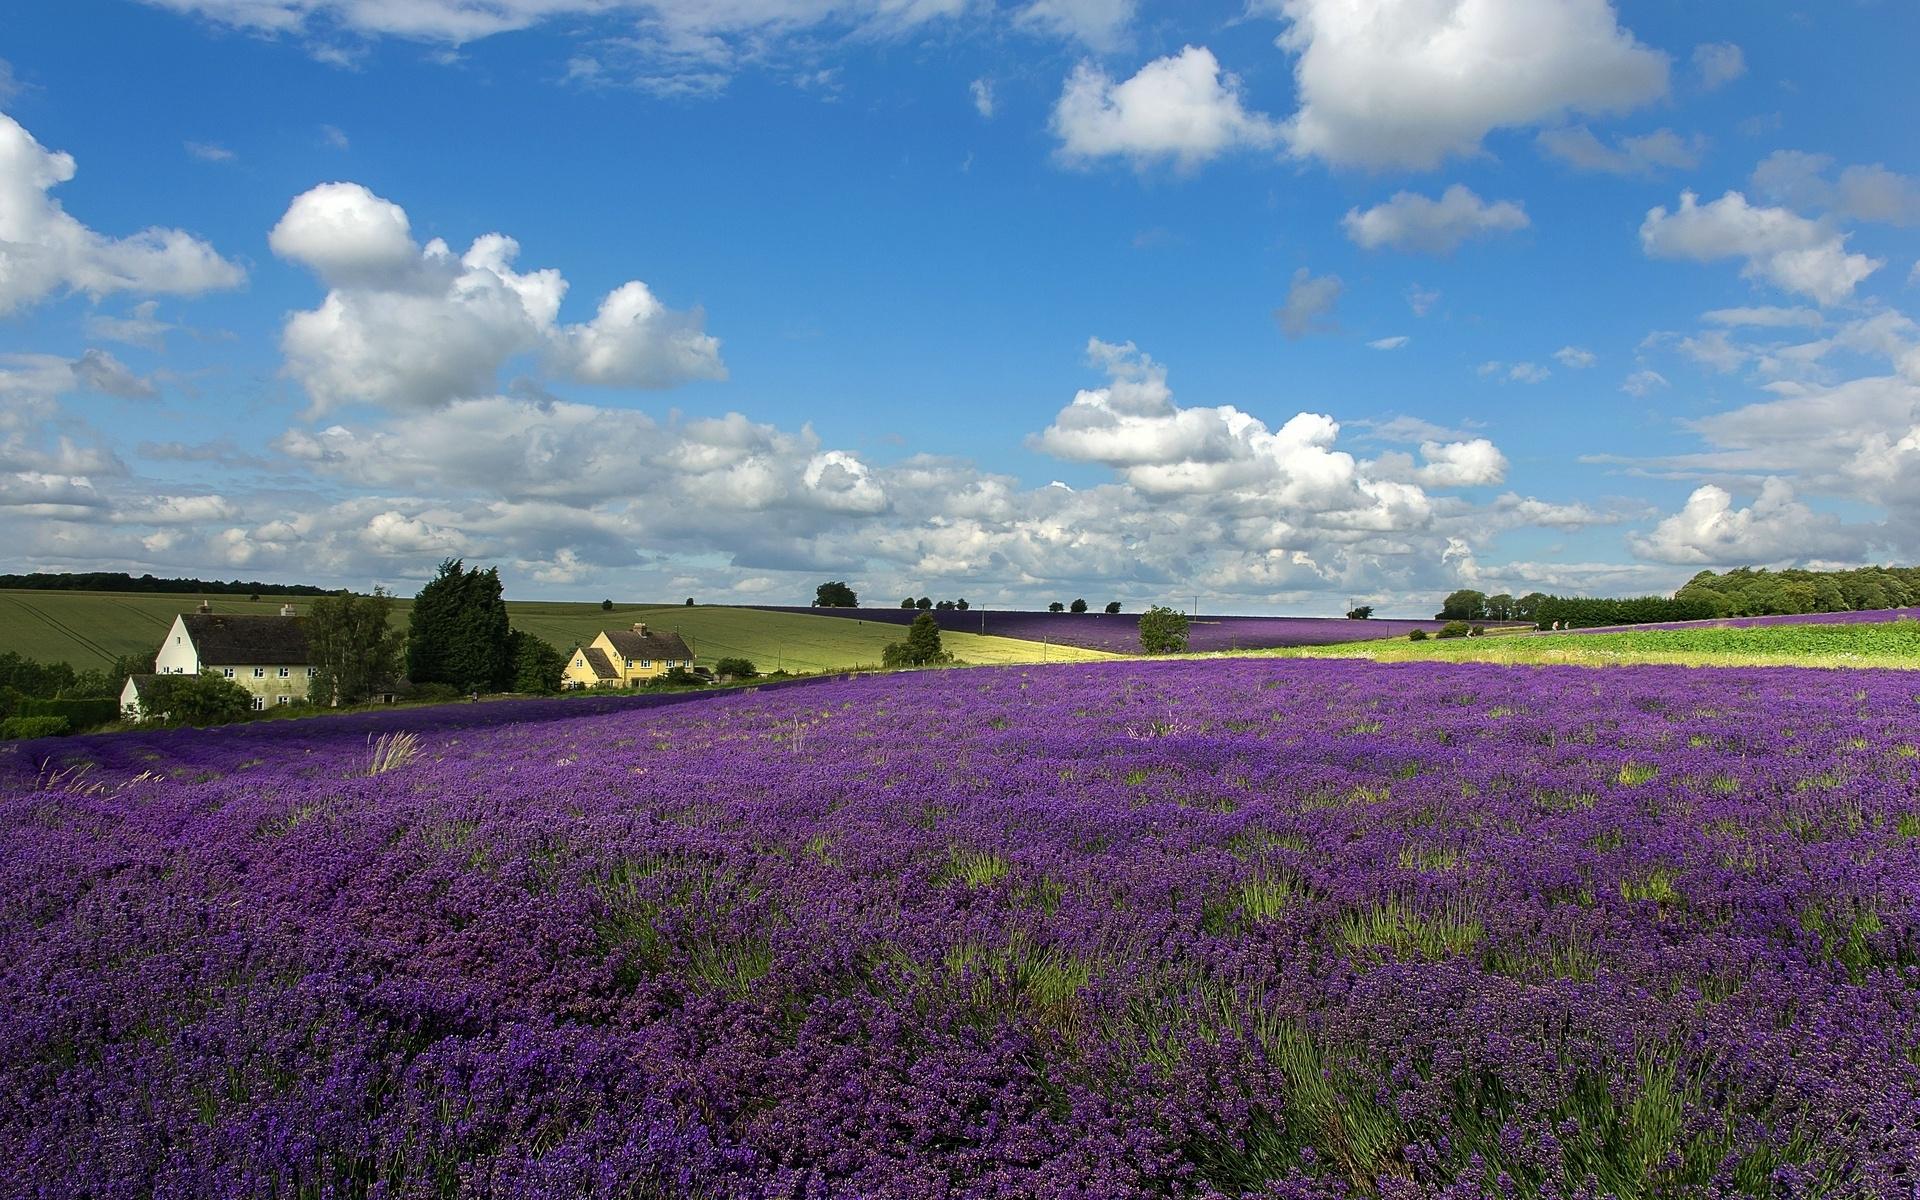 Lavender field wallpaper 24542 1920x1200